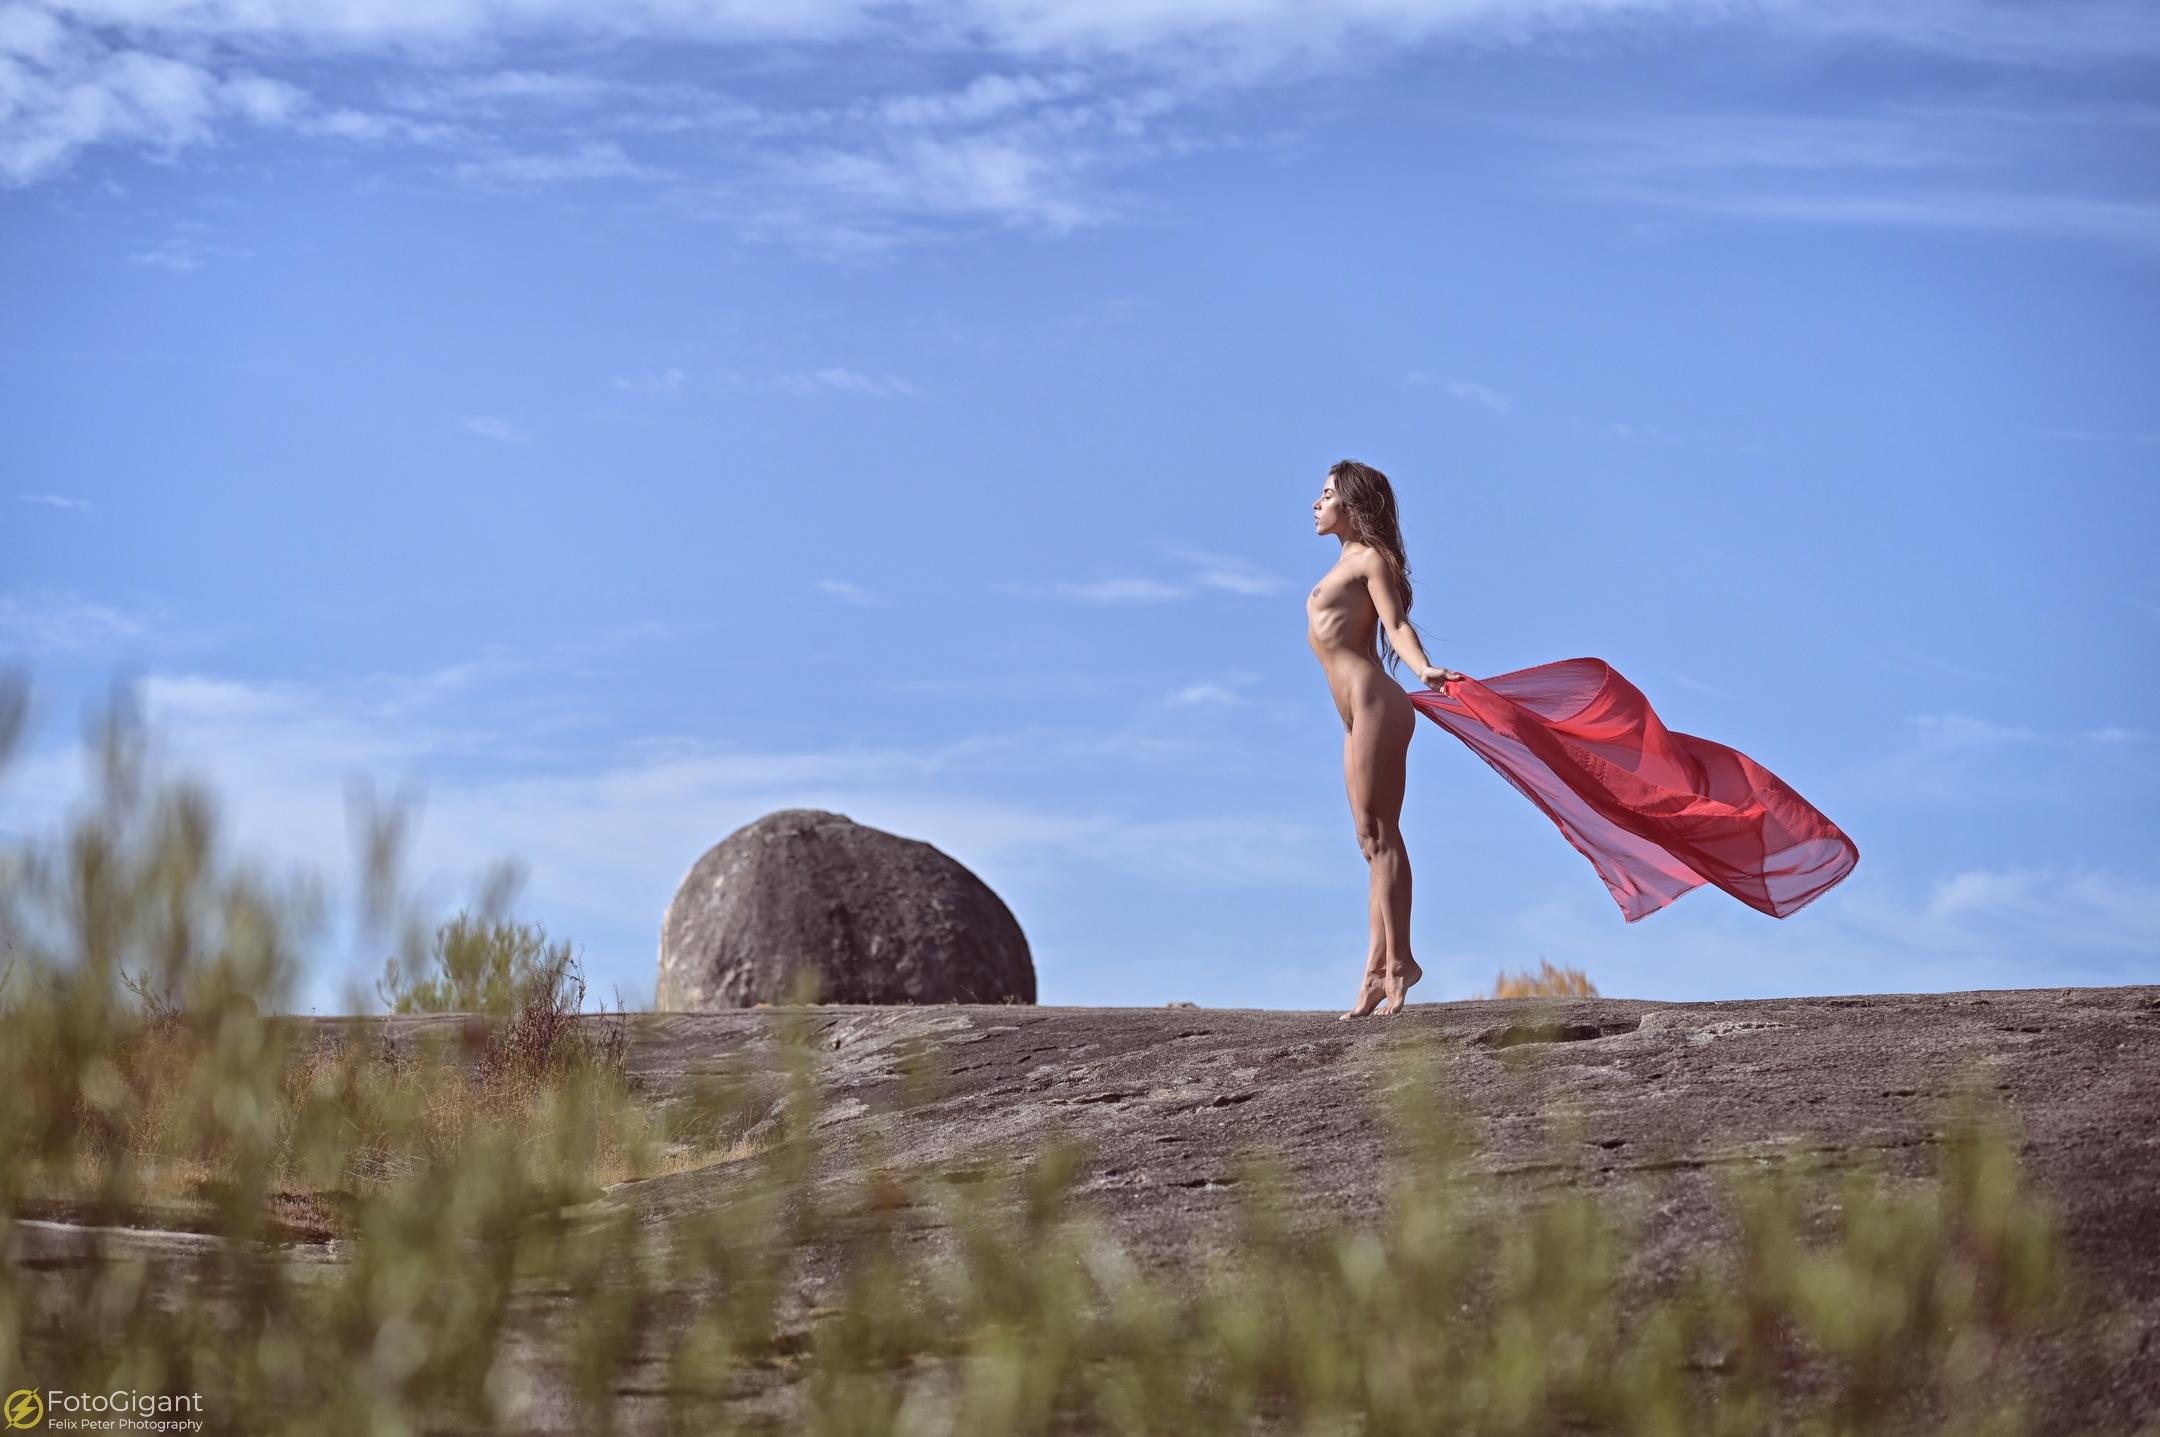 NudeArt_Aktfotografie_Eva-Luna_25.jpg